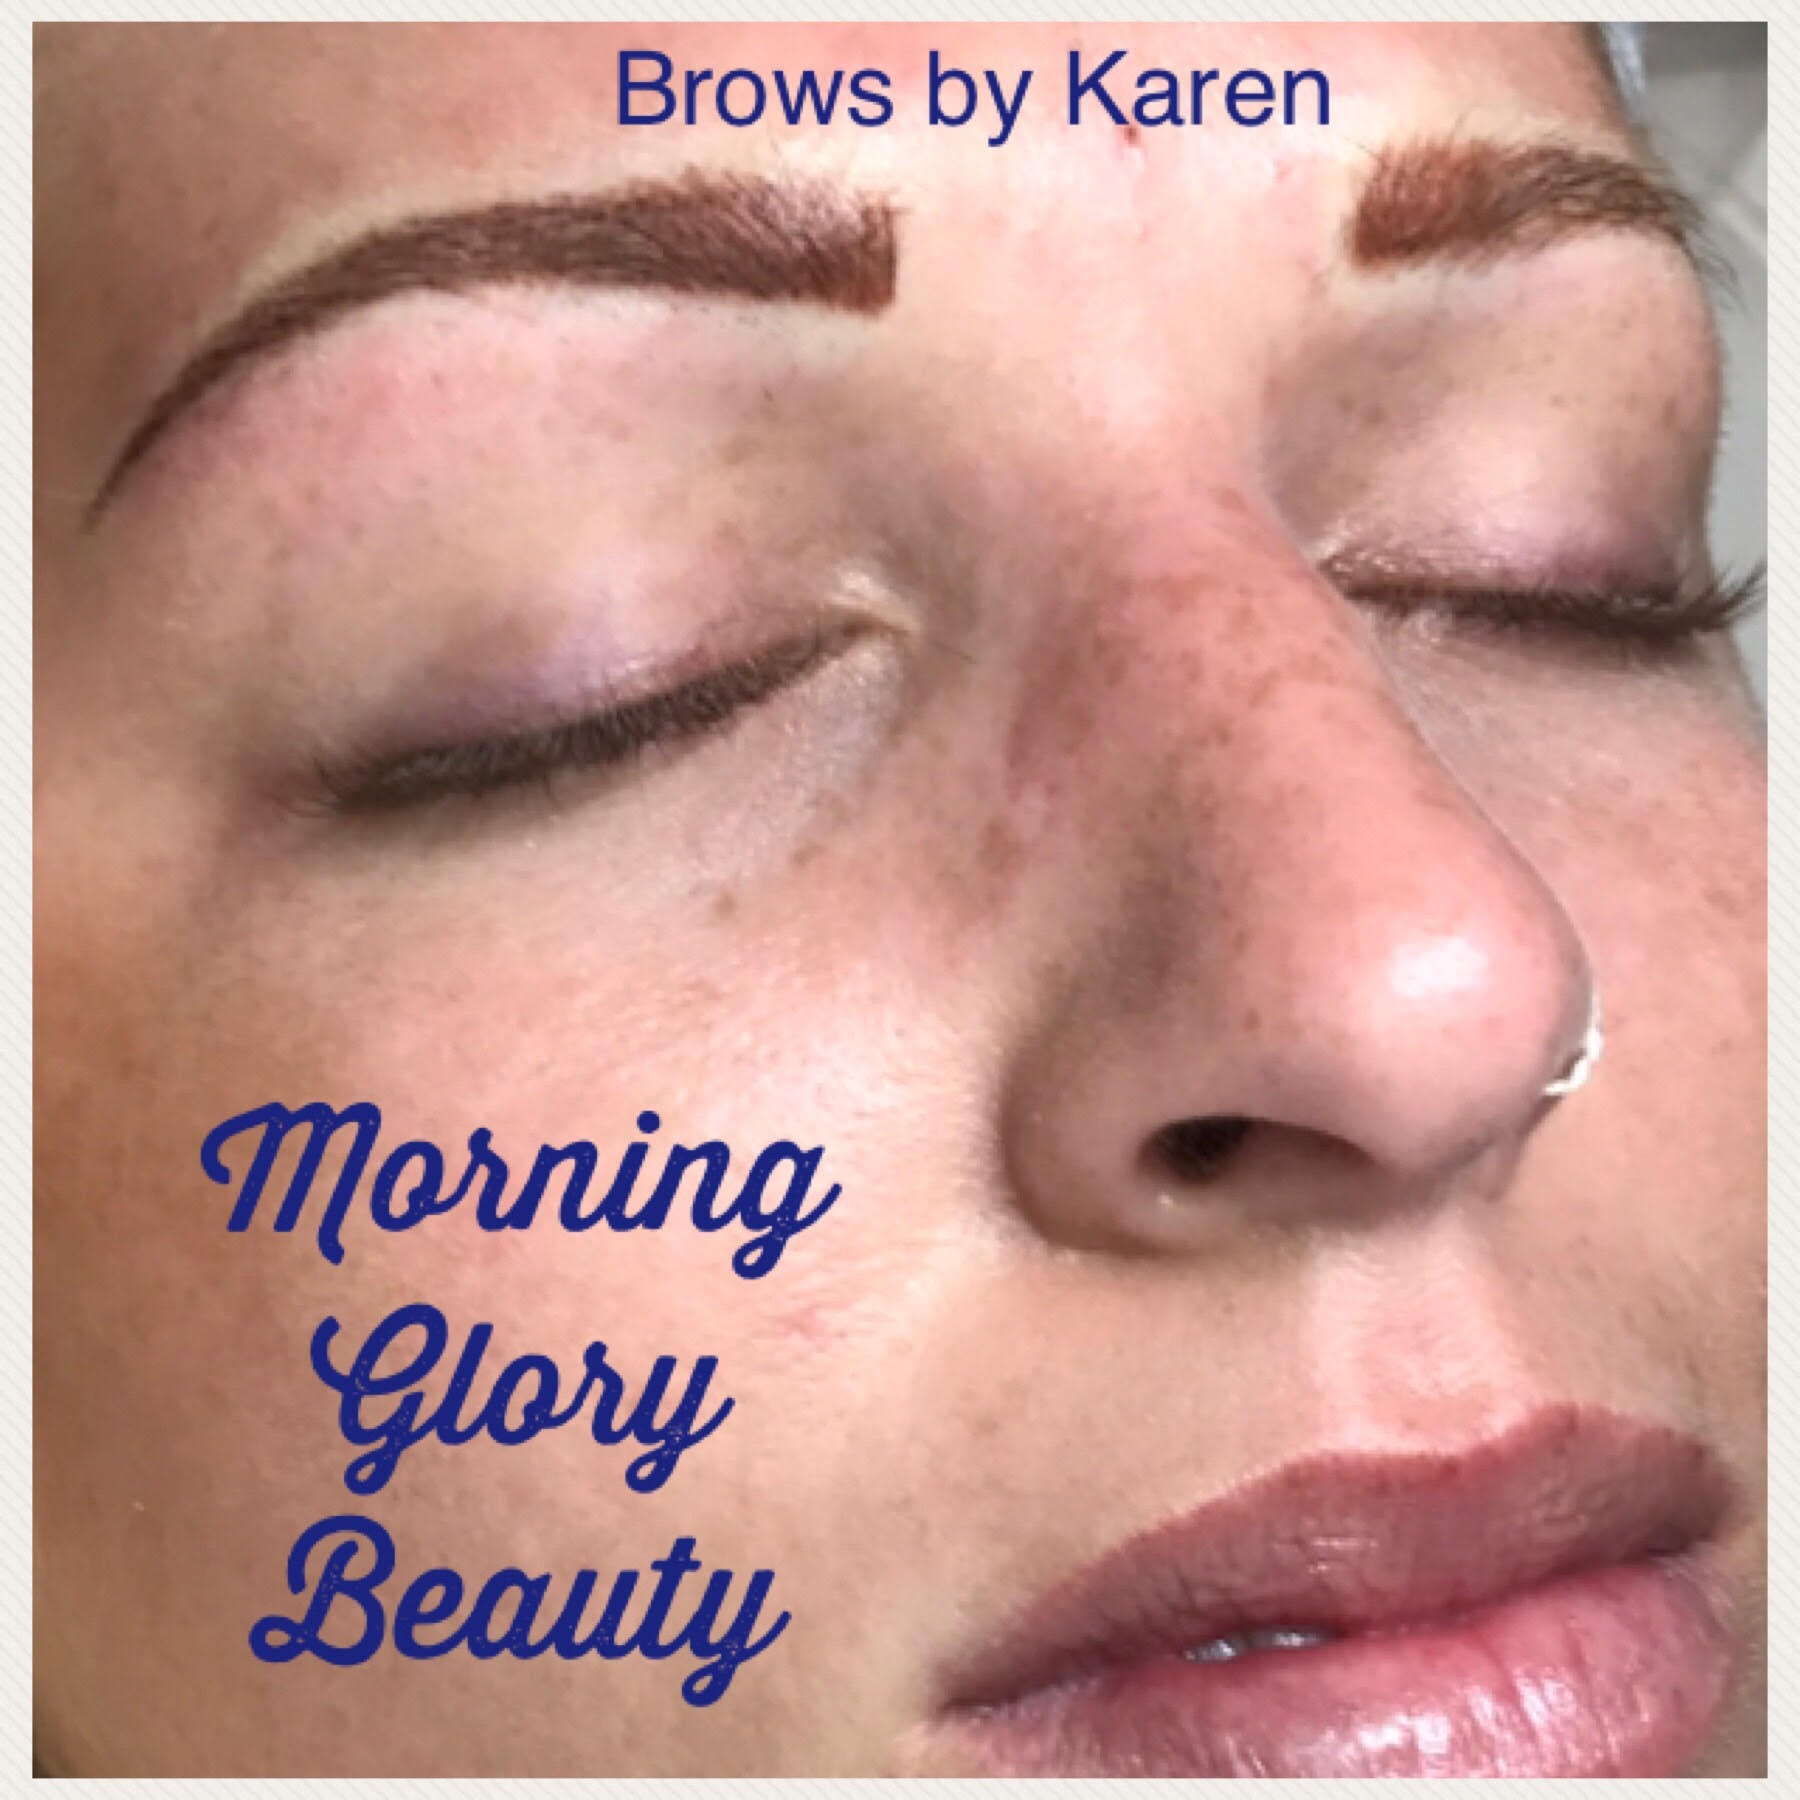 Morning Glory Beauty image 4